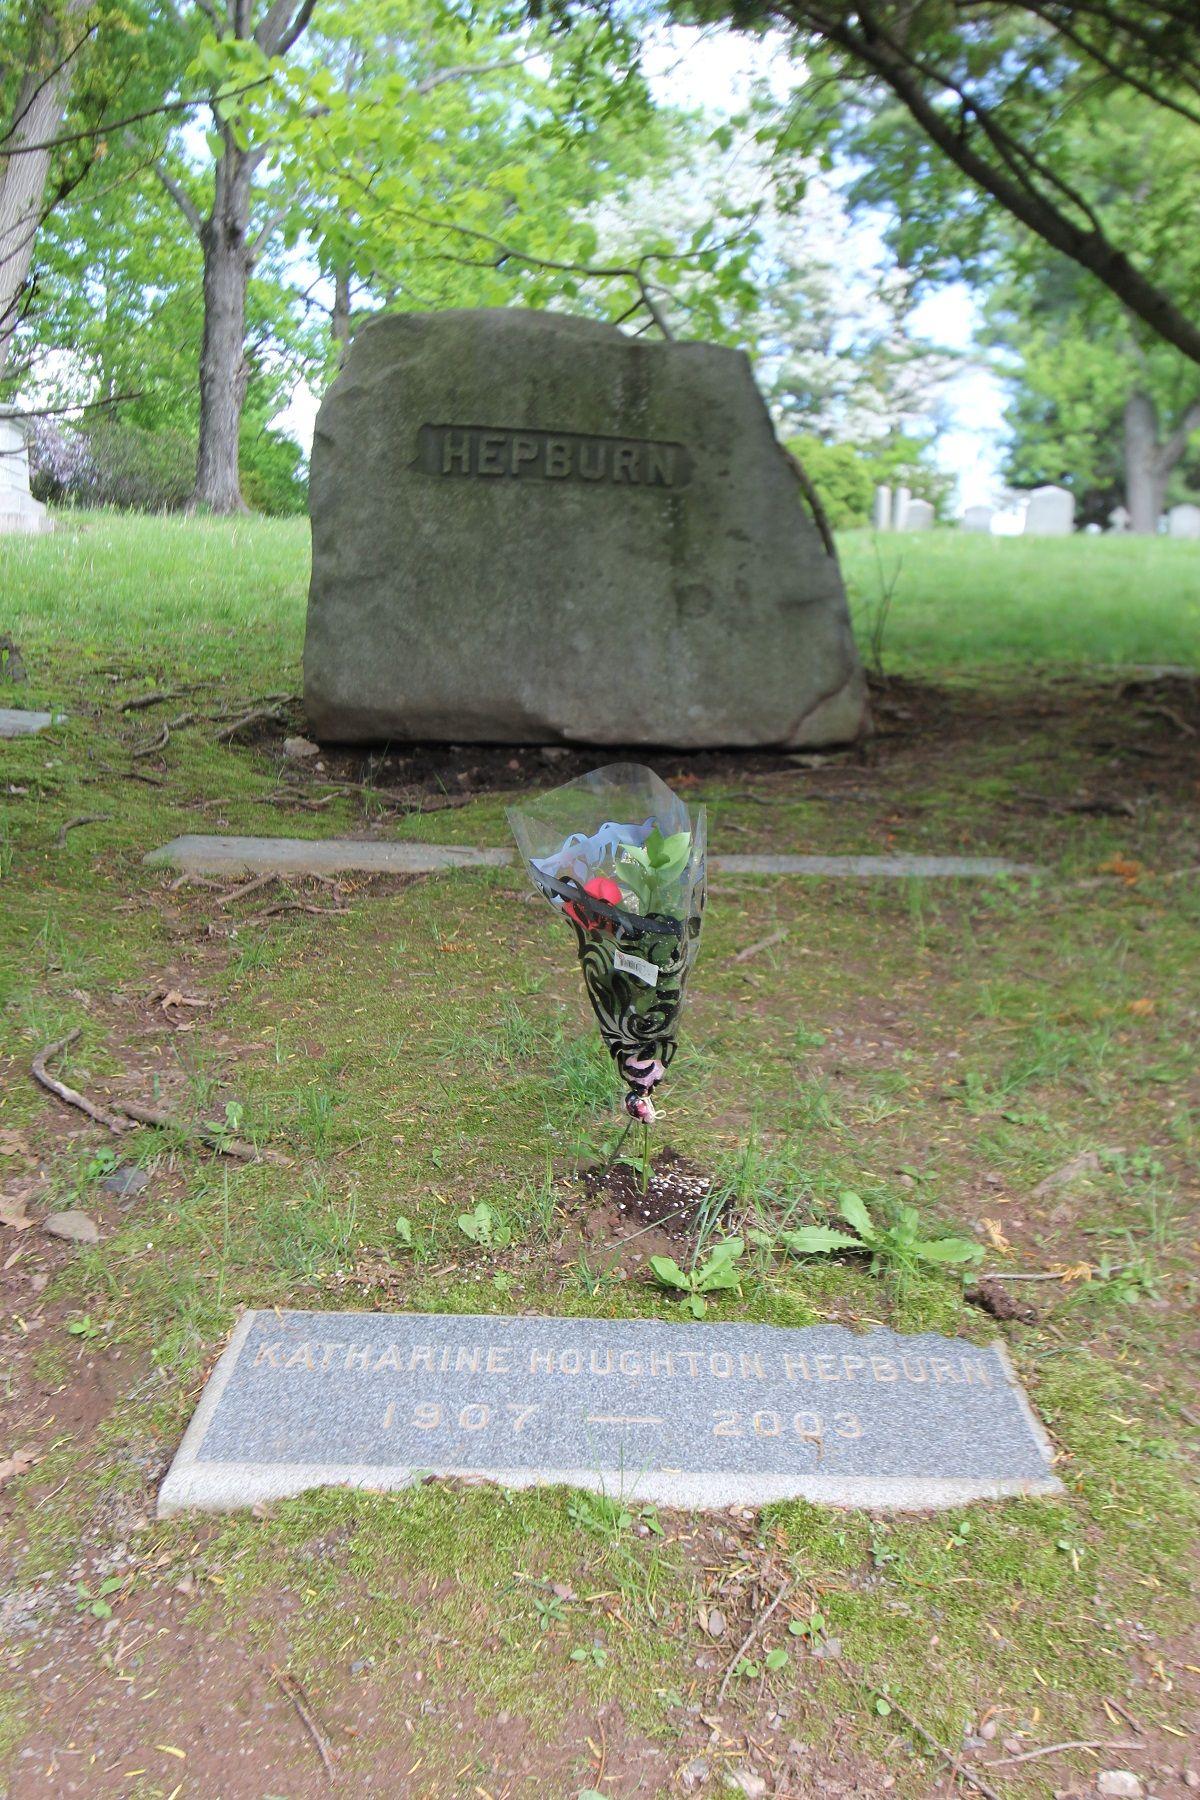 584d2a9f9acdac2c99214b638348a83e - Louisville Memorial Gardens Find A Grave